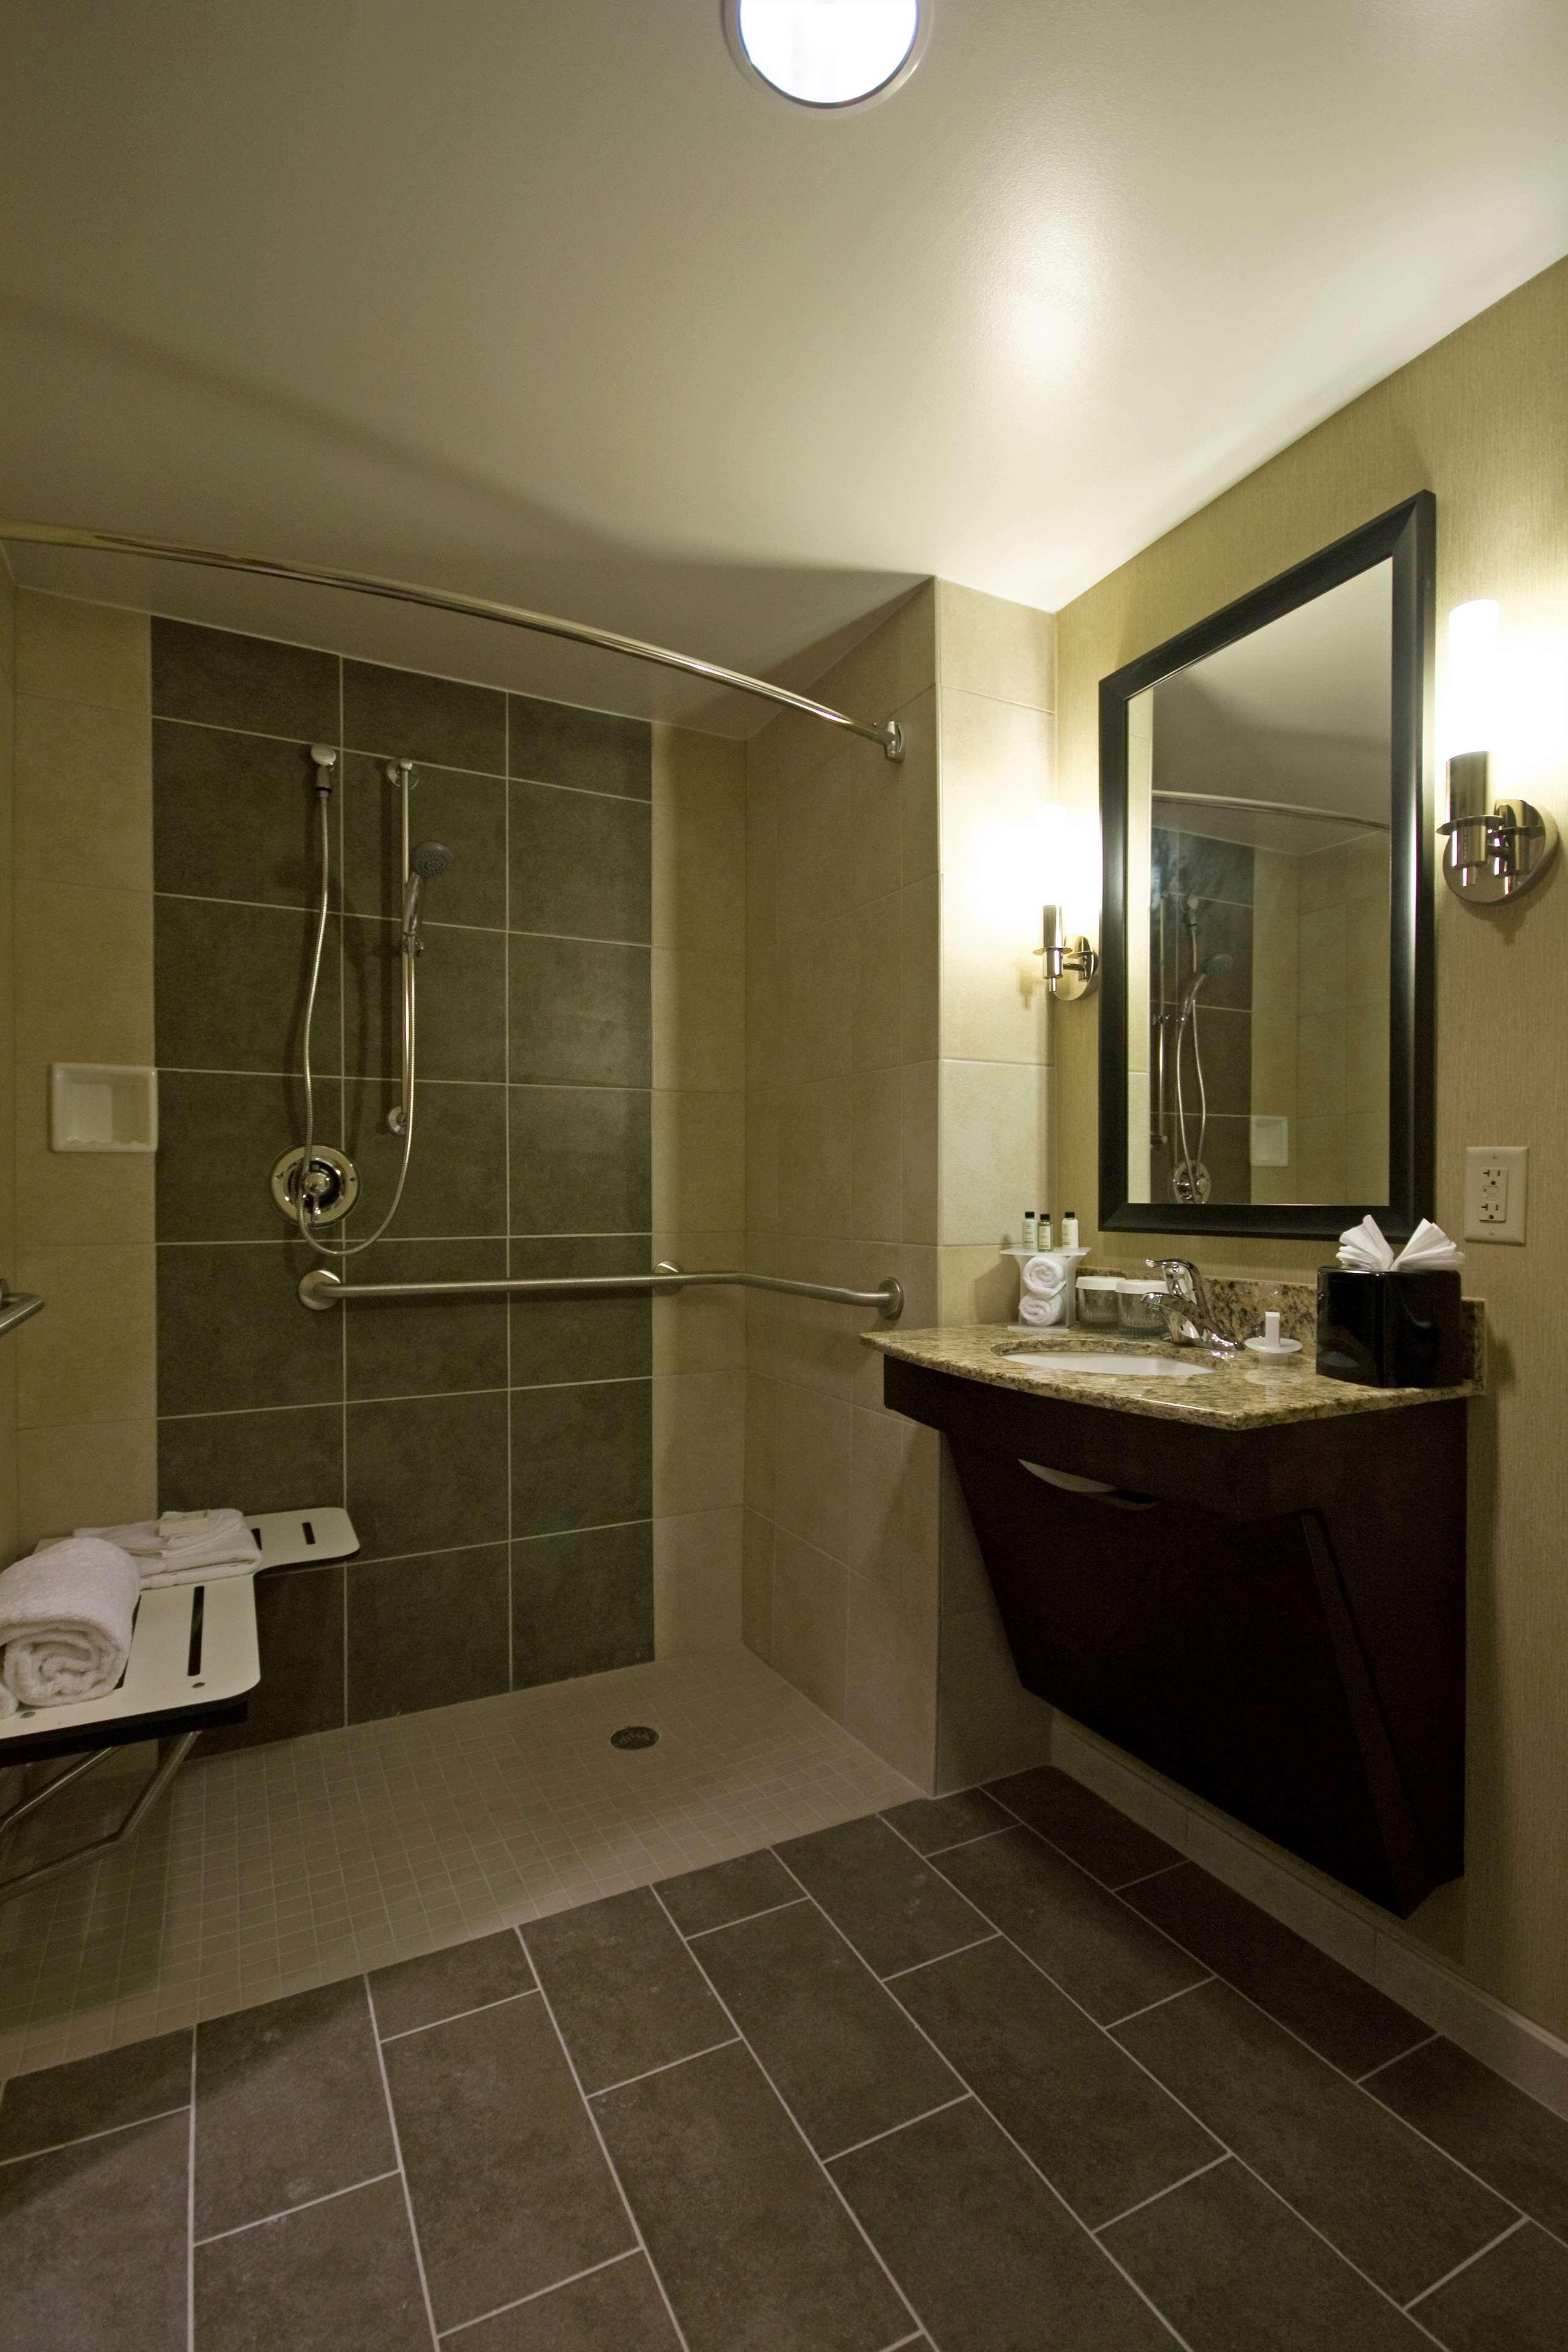 Embassy Suites by Hilton Houston Energy Corridor image 28